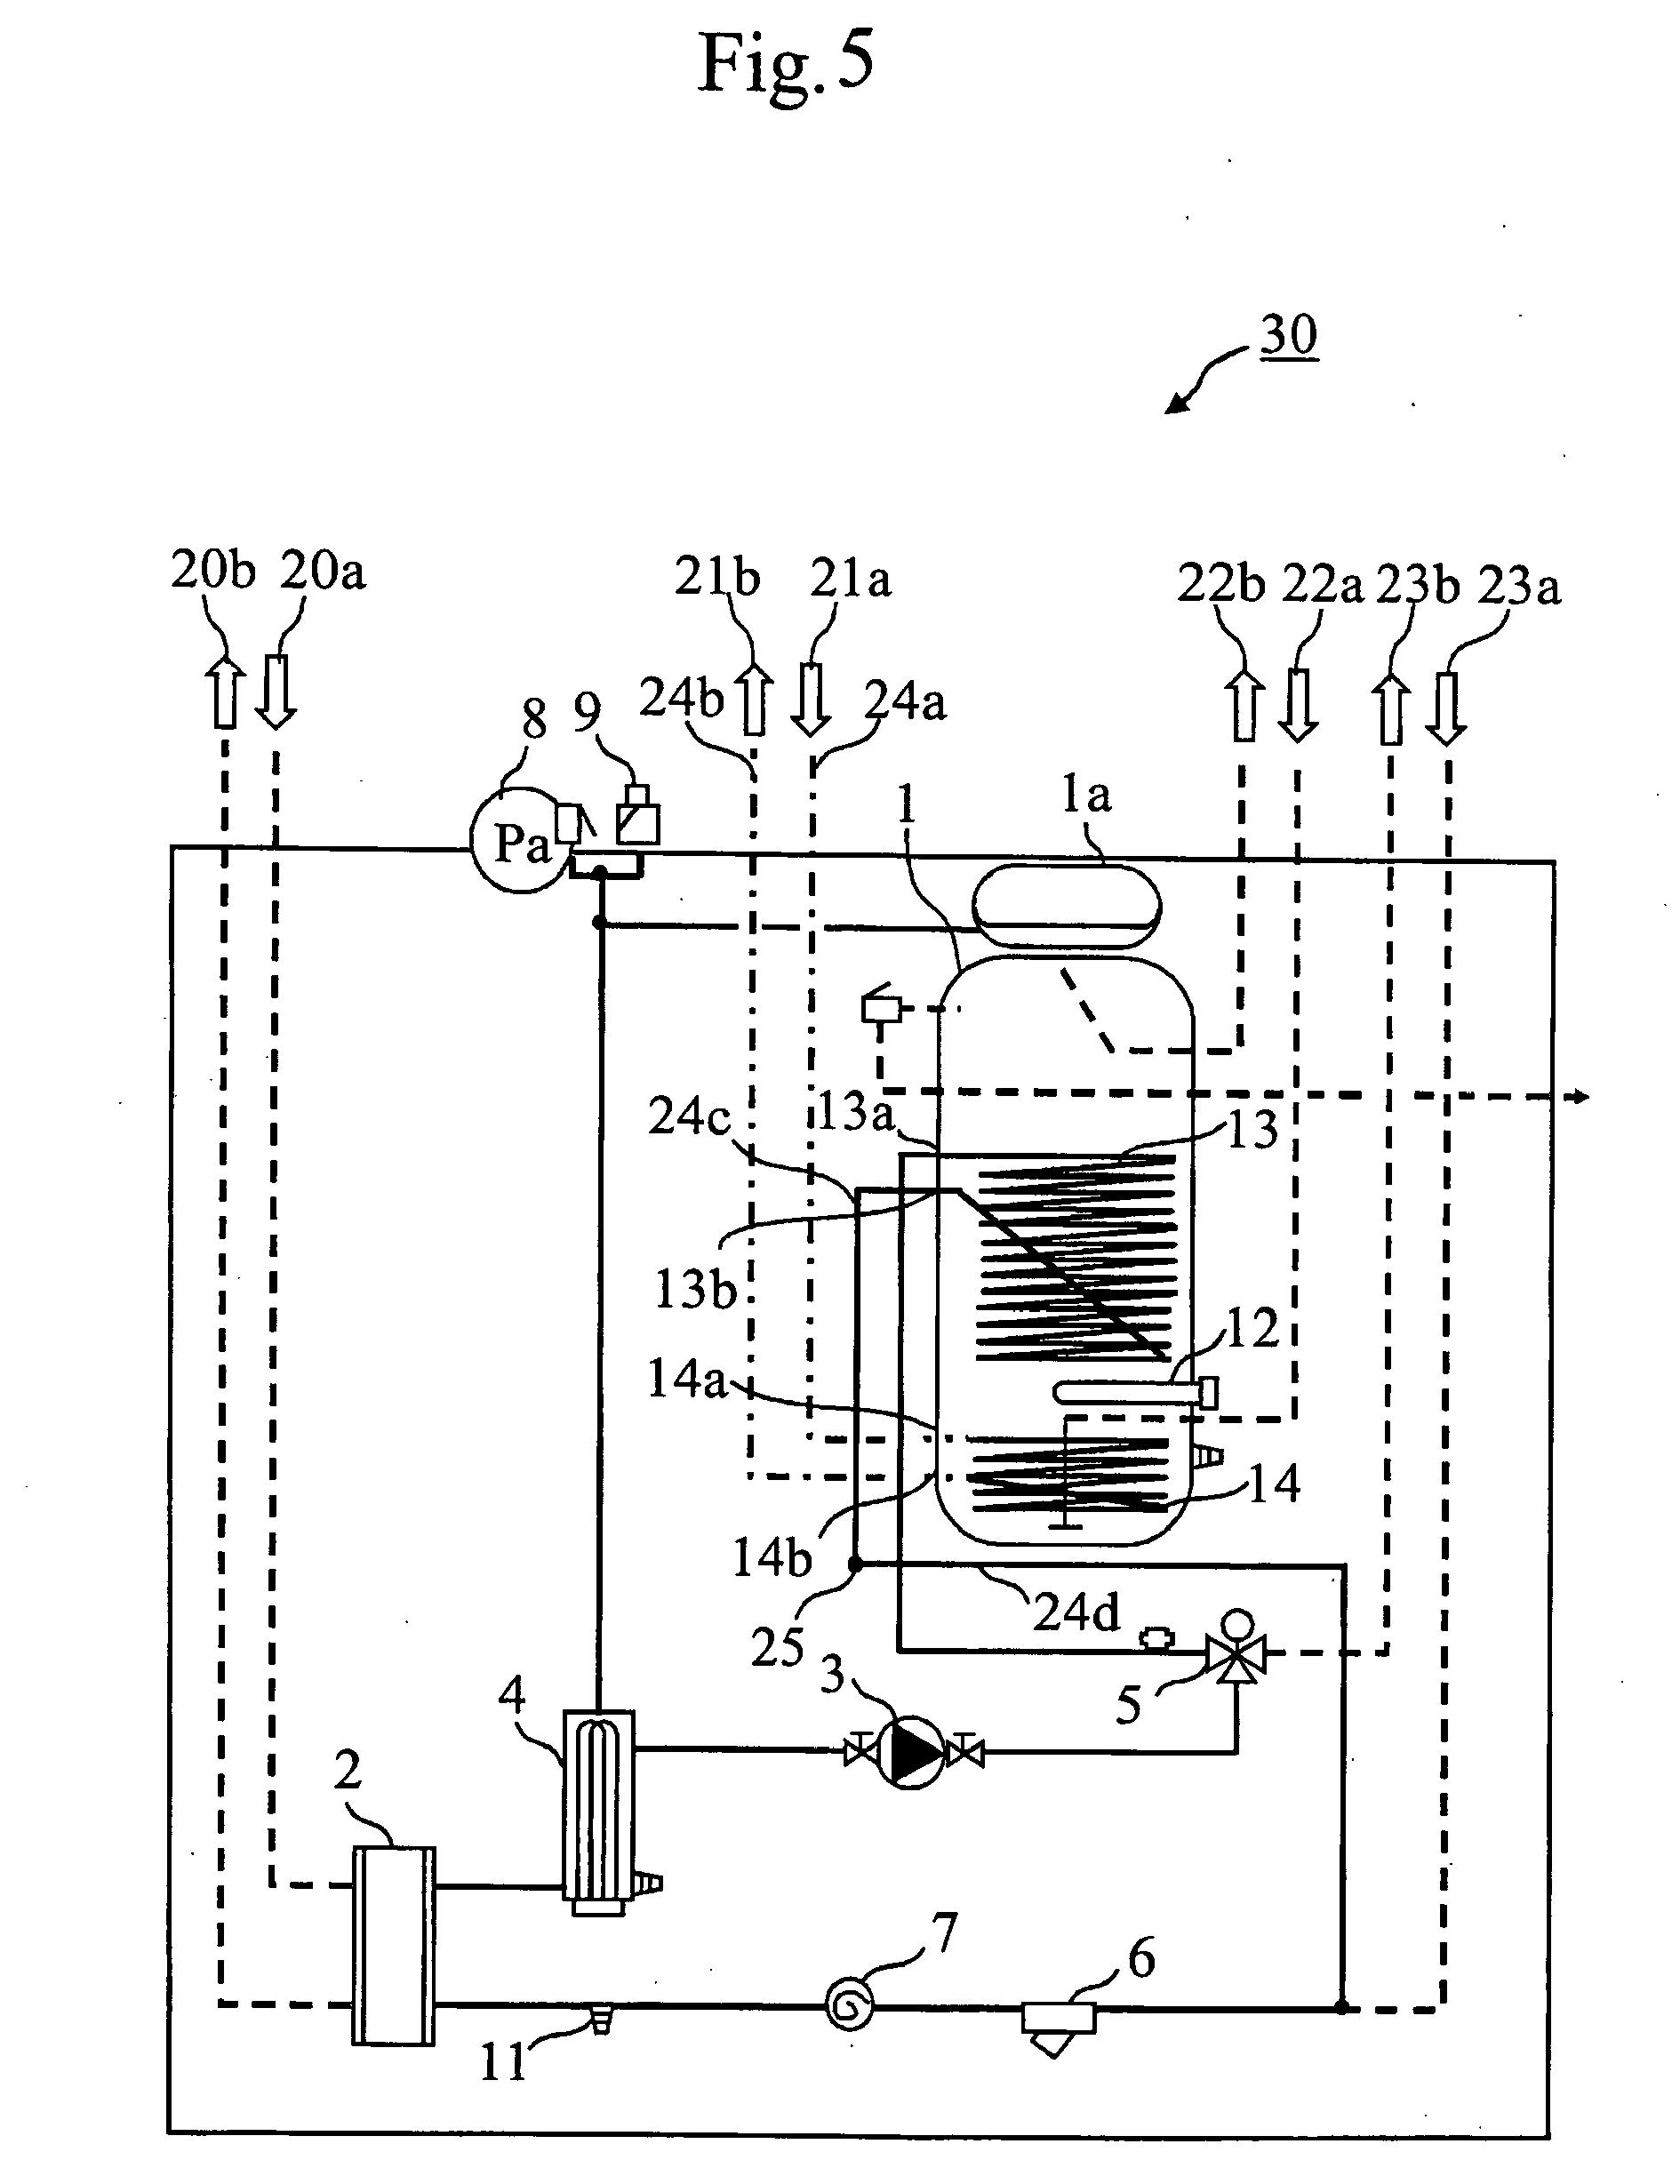 Baseboard Water Heating System Diagram Free Download Wiring Diagrams  #353535